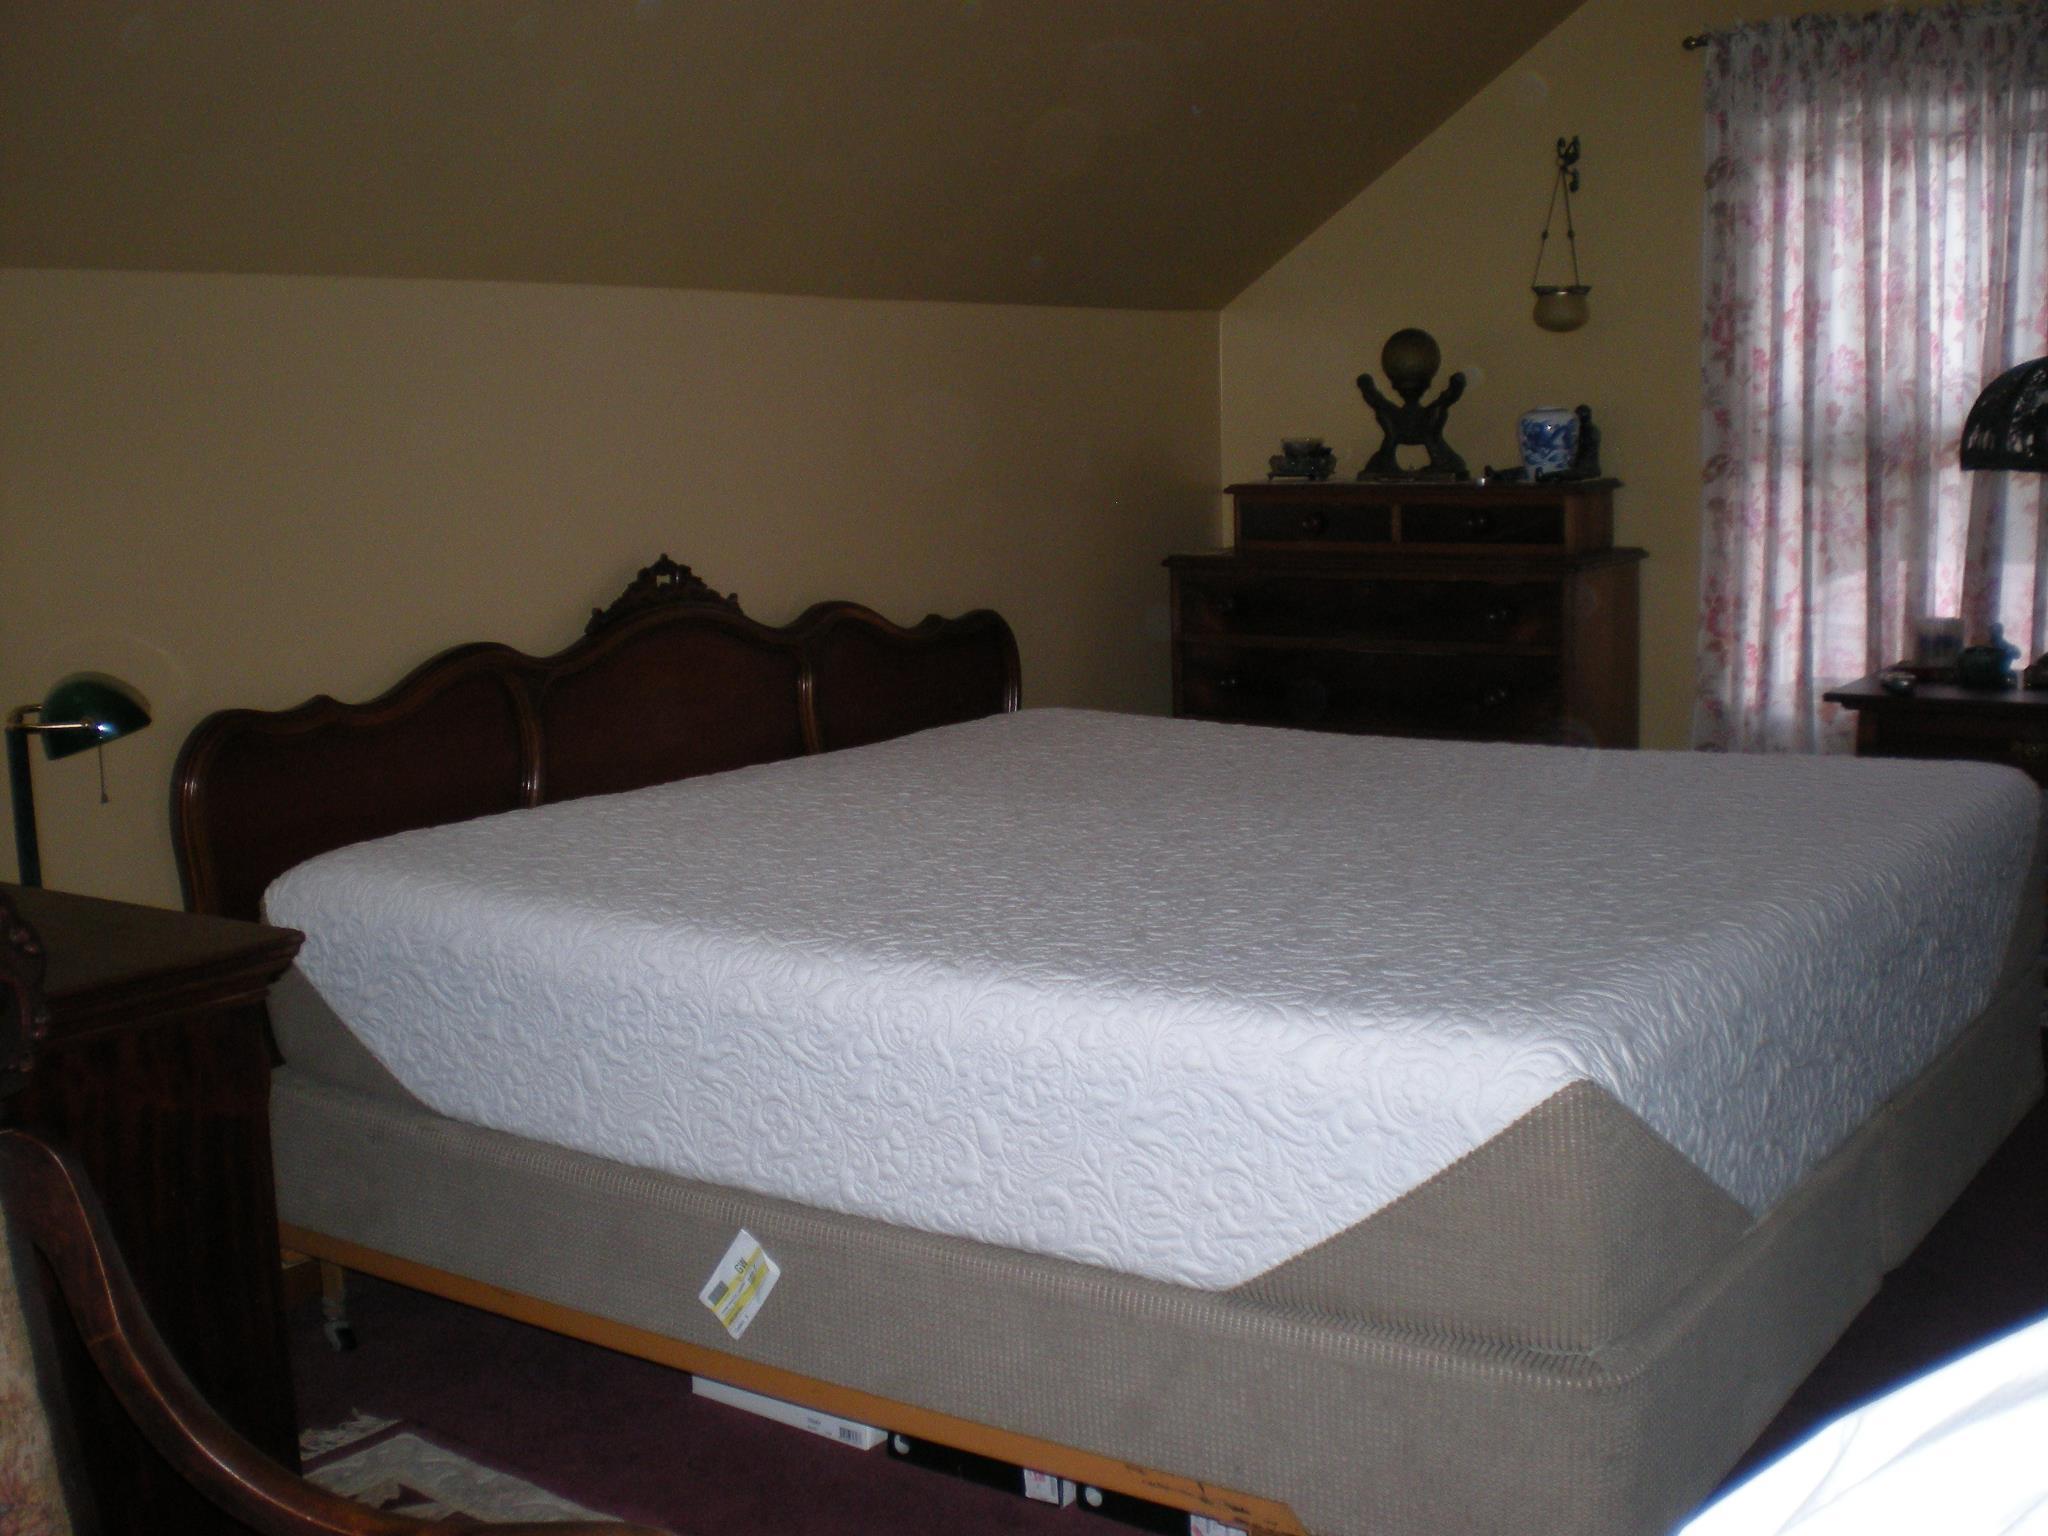 Description From Serta Icomfort Genius Bed Mattress Sale